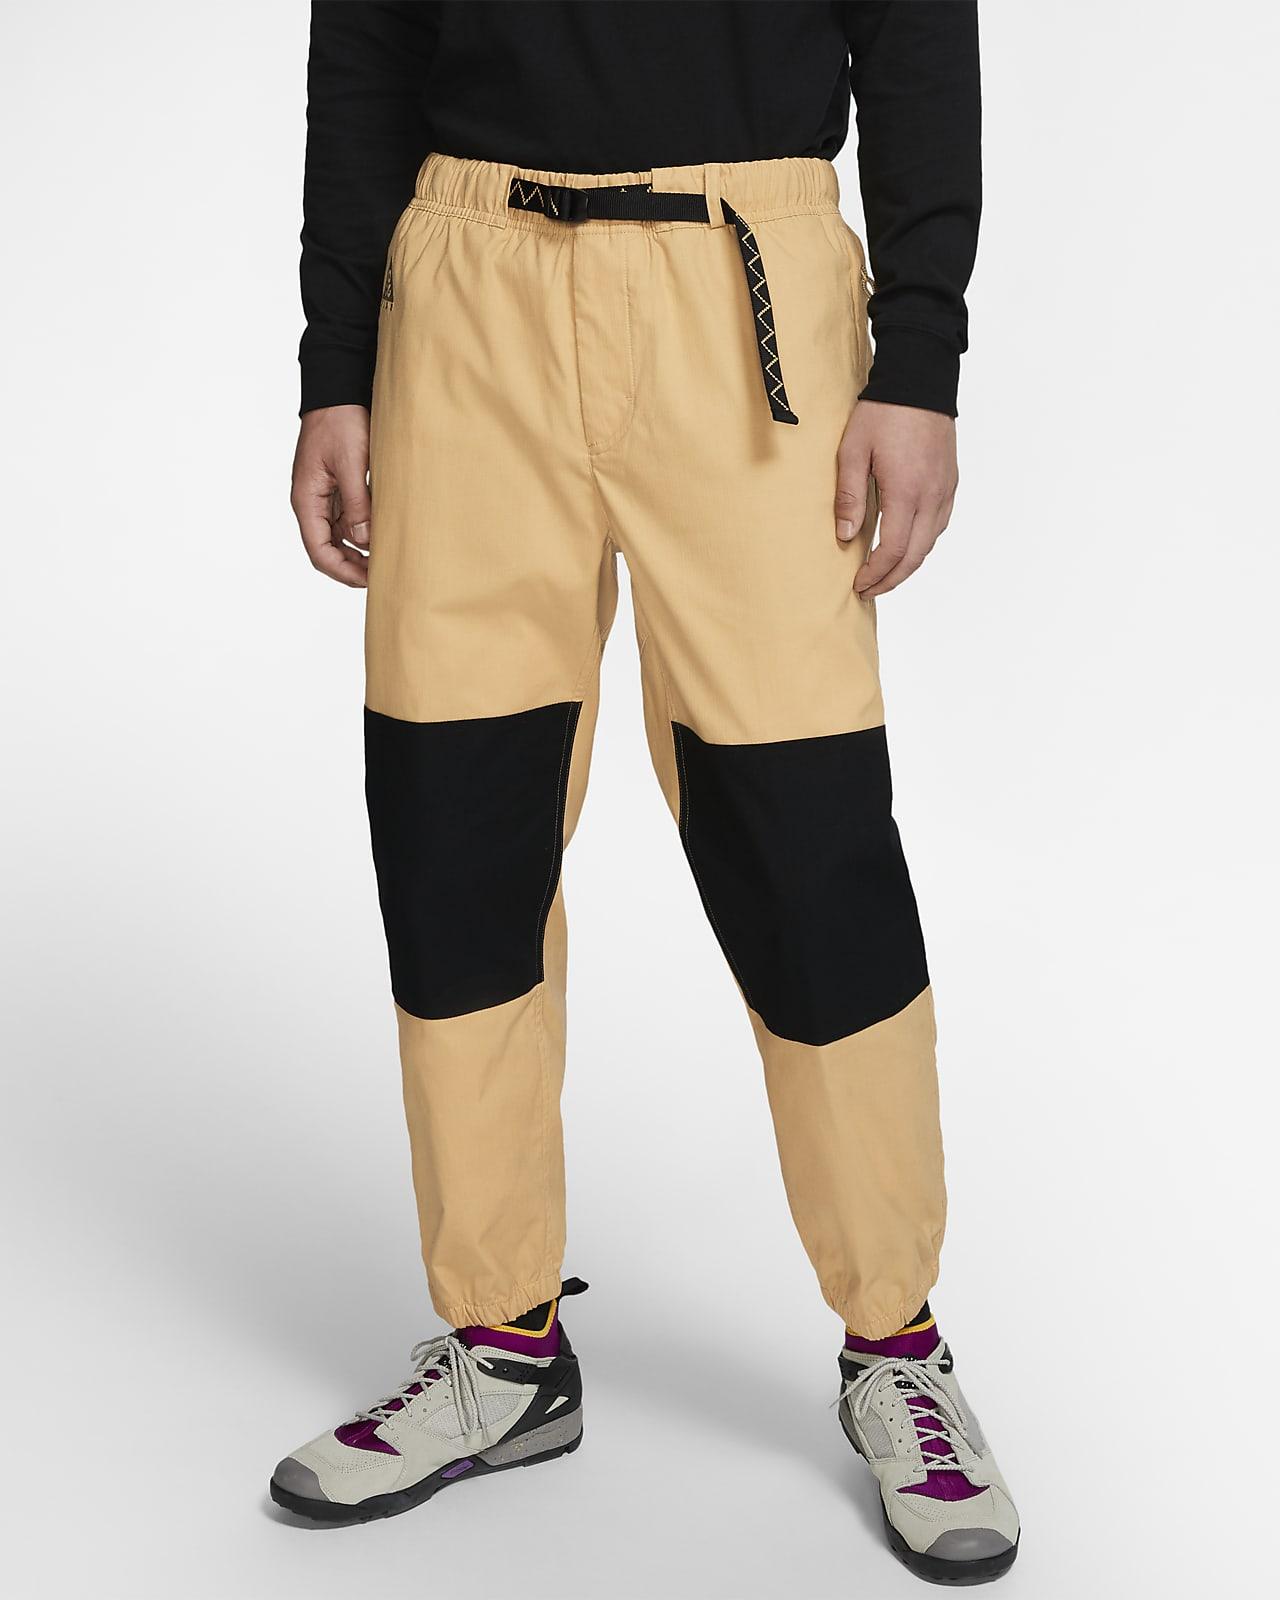 Sandalias Humedal astronauta  NikeLab ACG Men's Trail Trousers. Nike VN